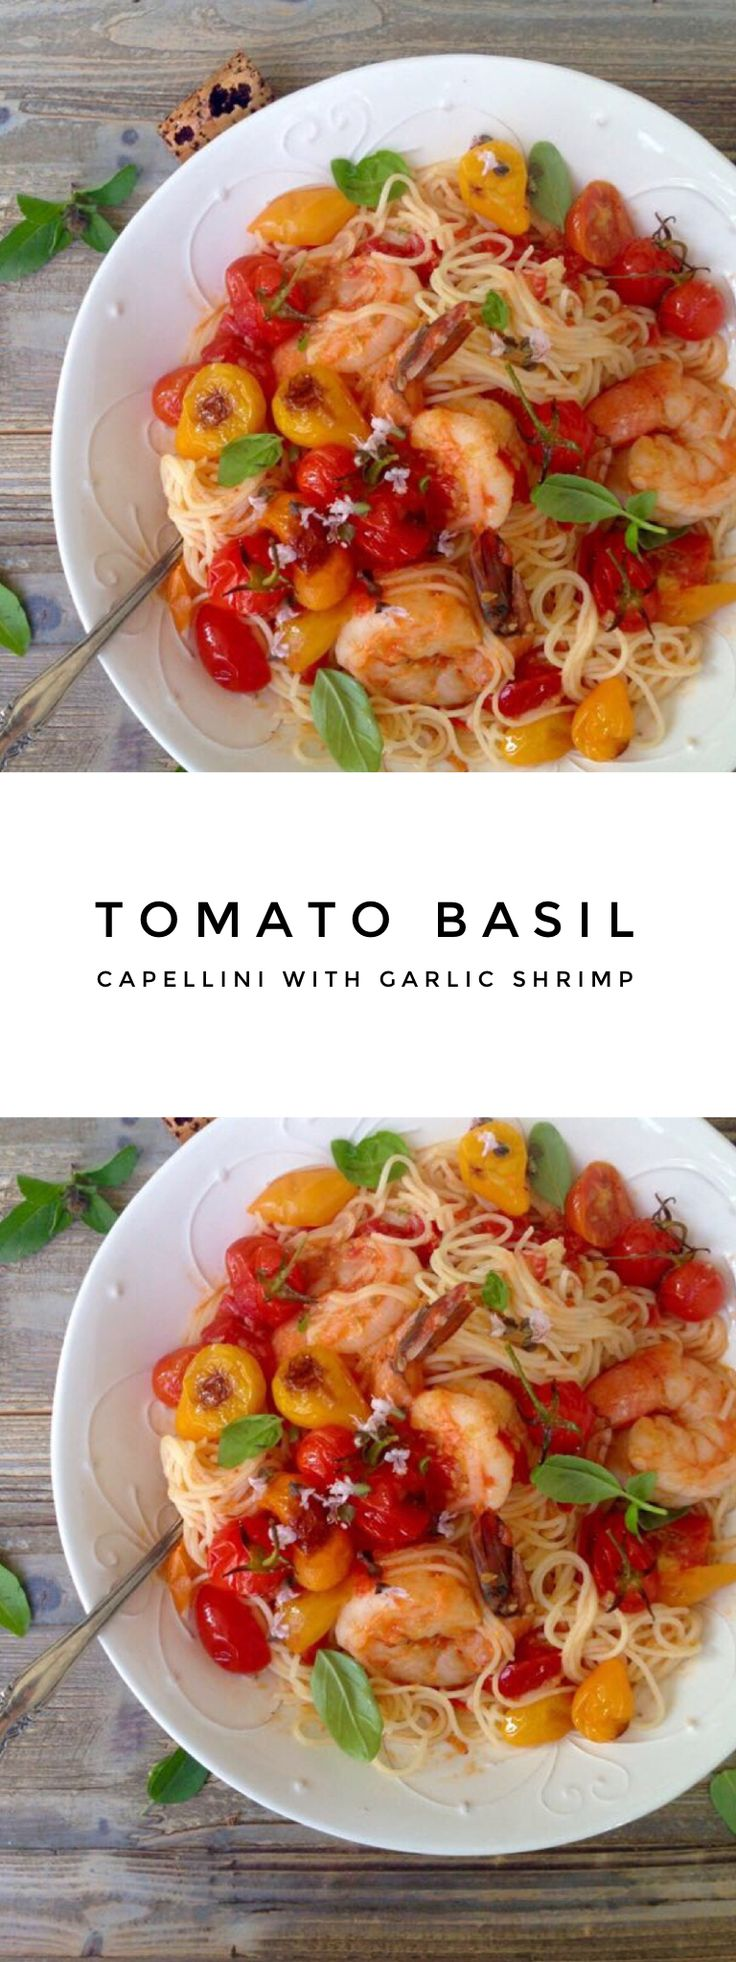 Tomato Basil Capellini Pasta with Garlic Shrimp | CiaoFlorentina.com @CiaoFlorentina